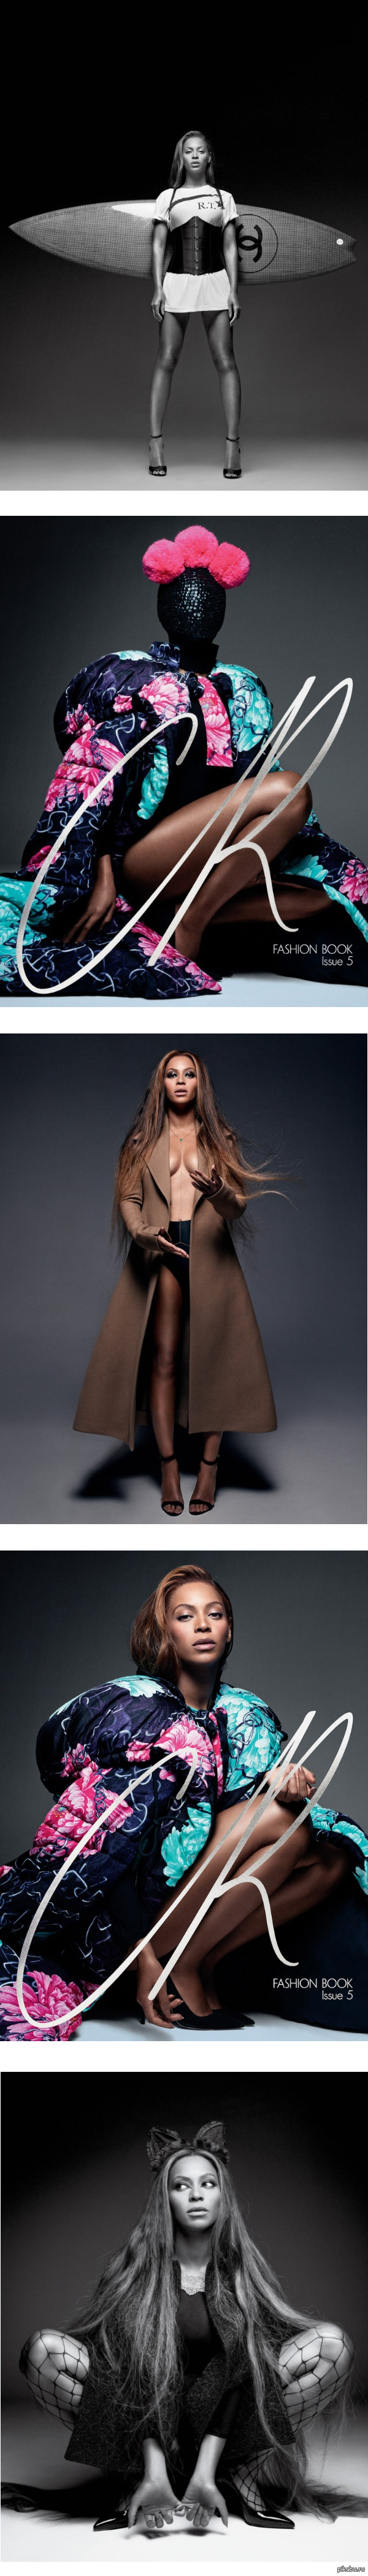 Beyonce снялась для издания CR Fashion Book